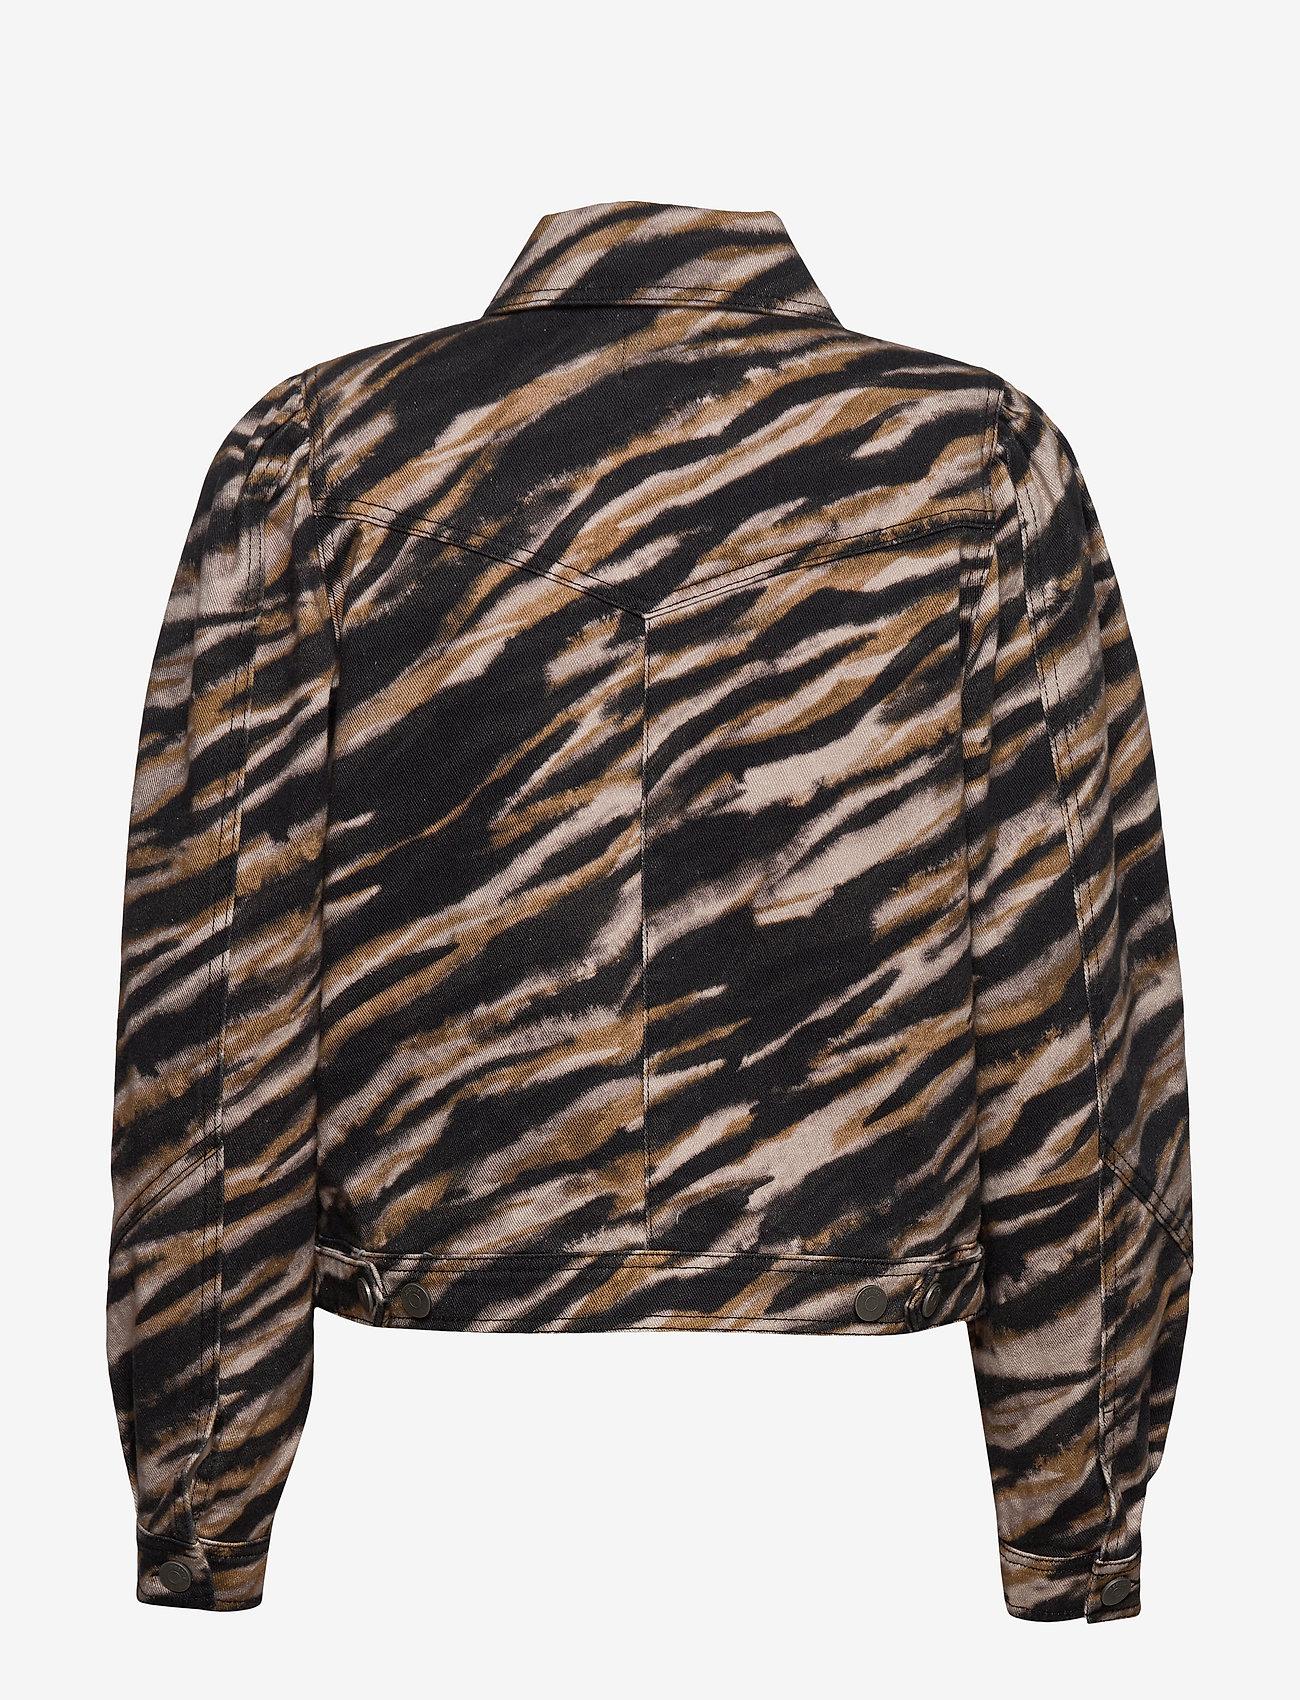 Felinegz Jacket Ao20 (Army Tiger) - Gestuz HuZhzH